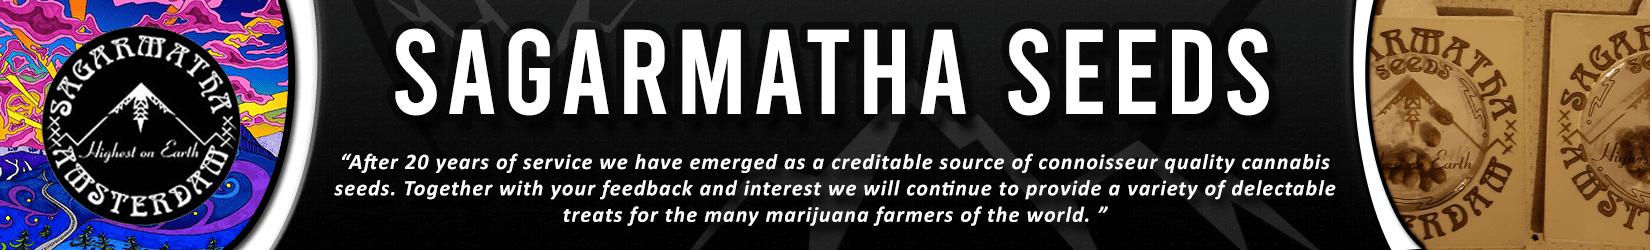 Cannabis Seeds Breeder - Sagarmatha Seeds